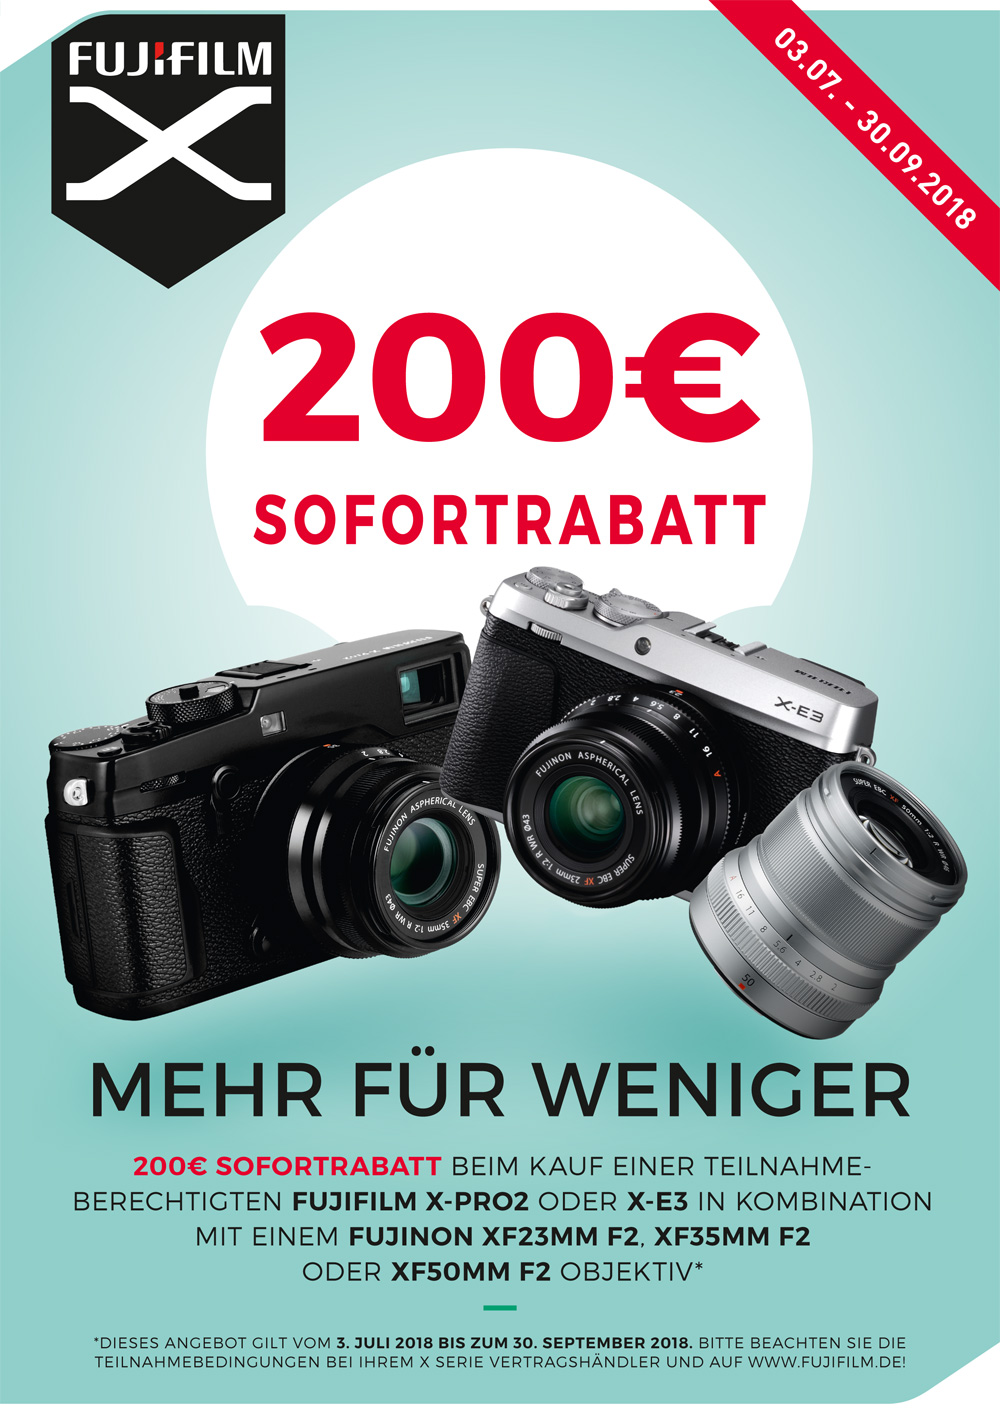 Fujifilm X-Pro2 & X-E3 Sommer Aktion